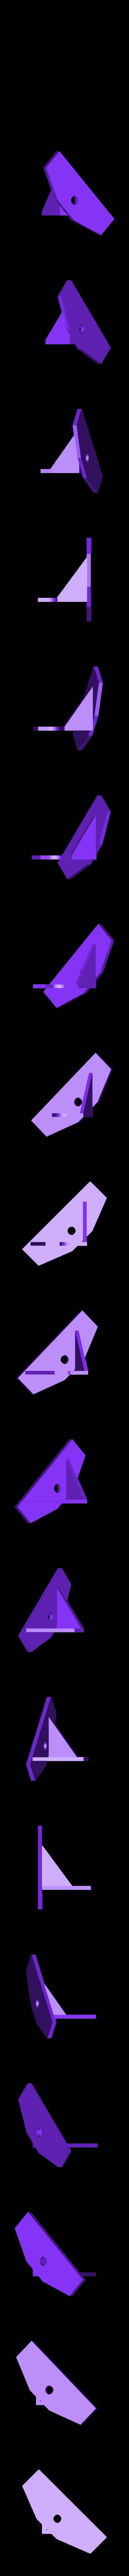 MirrorTrain_Indicator_Bracket_Left.STL Download free STL file 4-8-8-4 Big Boy Locomotive • 3D printer object, RaymondDeLuca